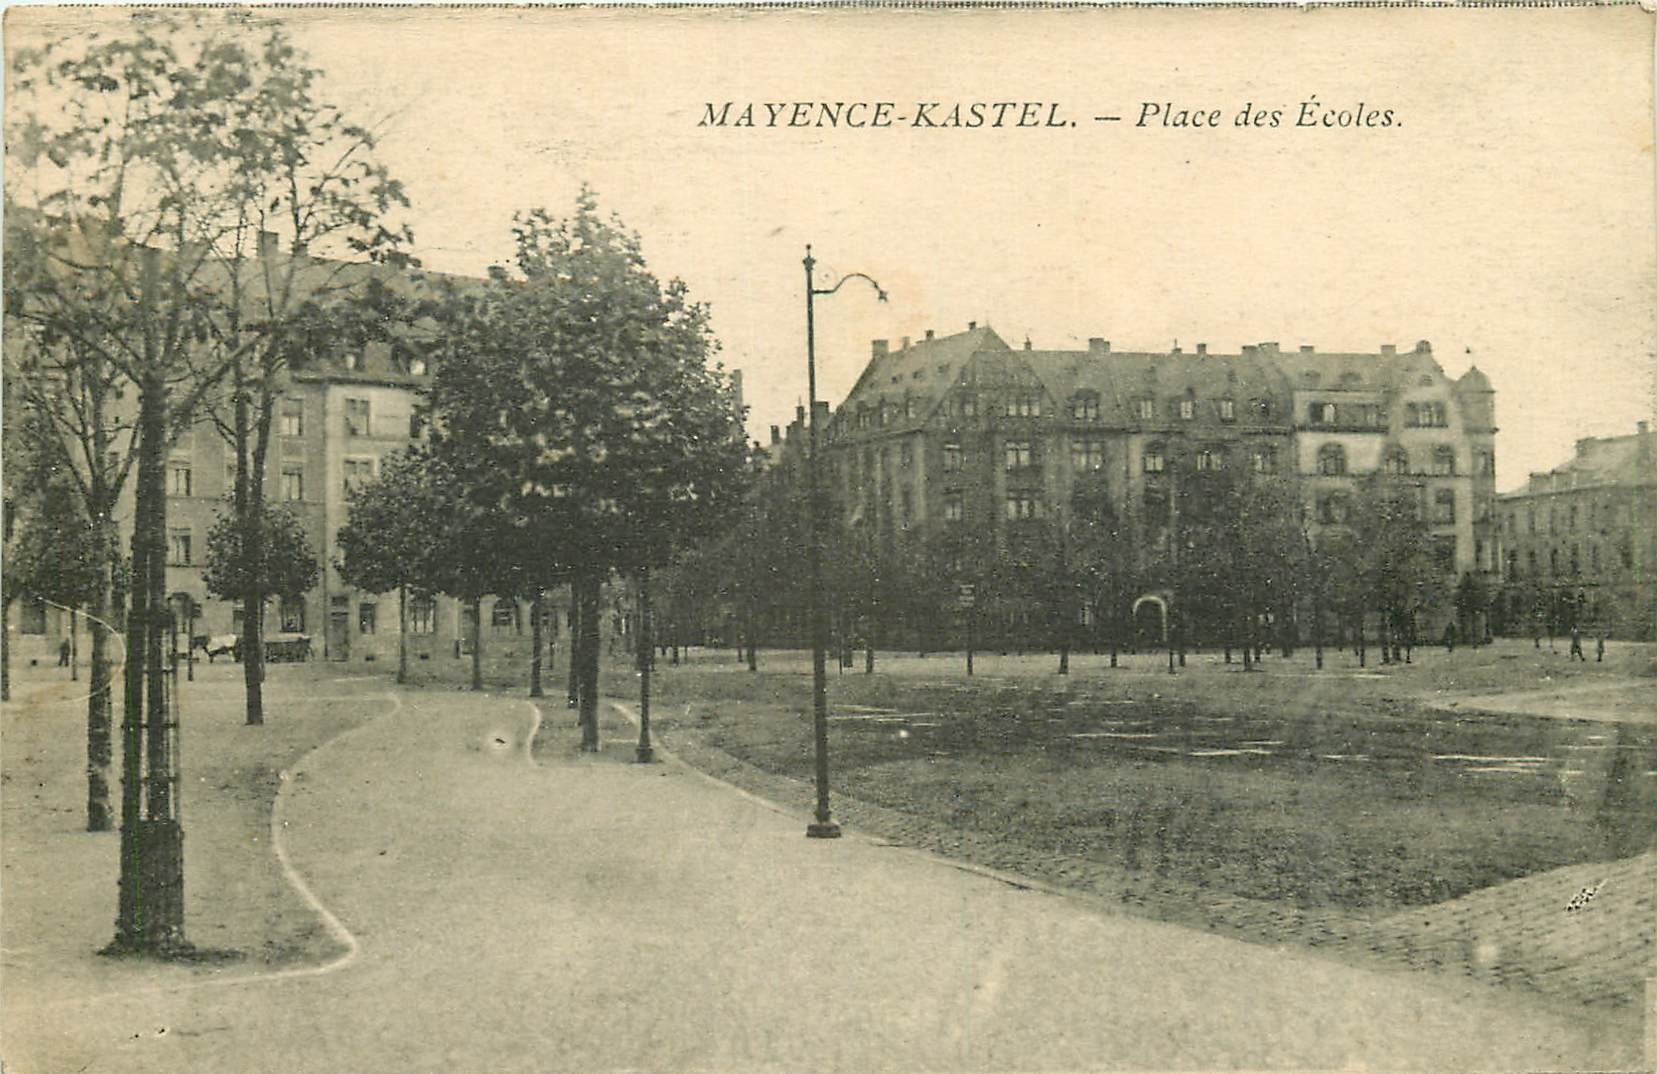 MAYENCE KASTEL. Place des Ecoles en Allemagne